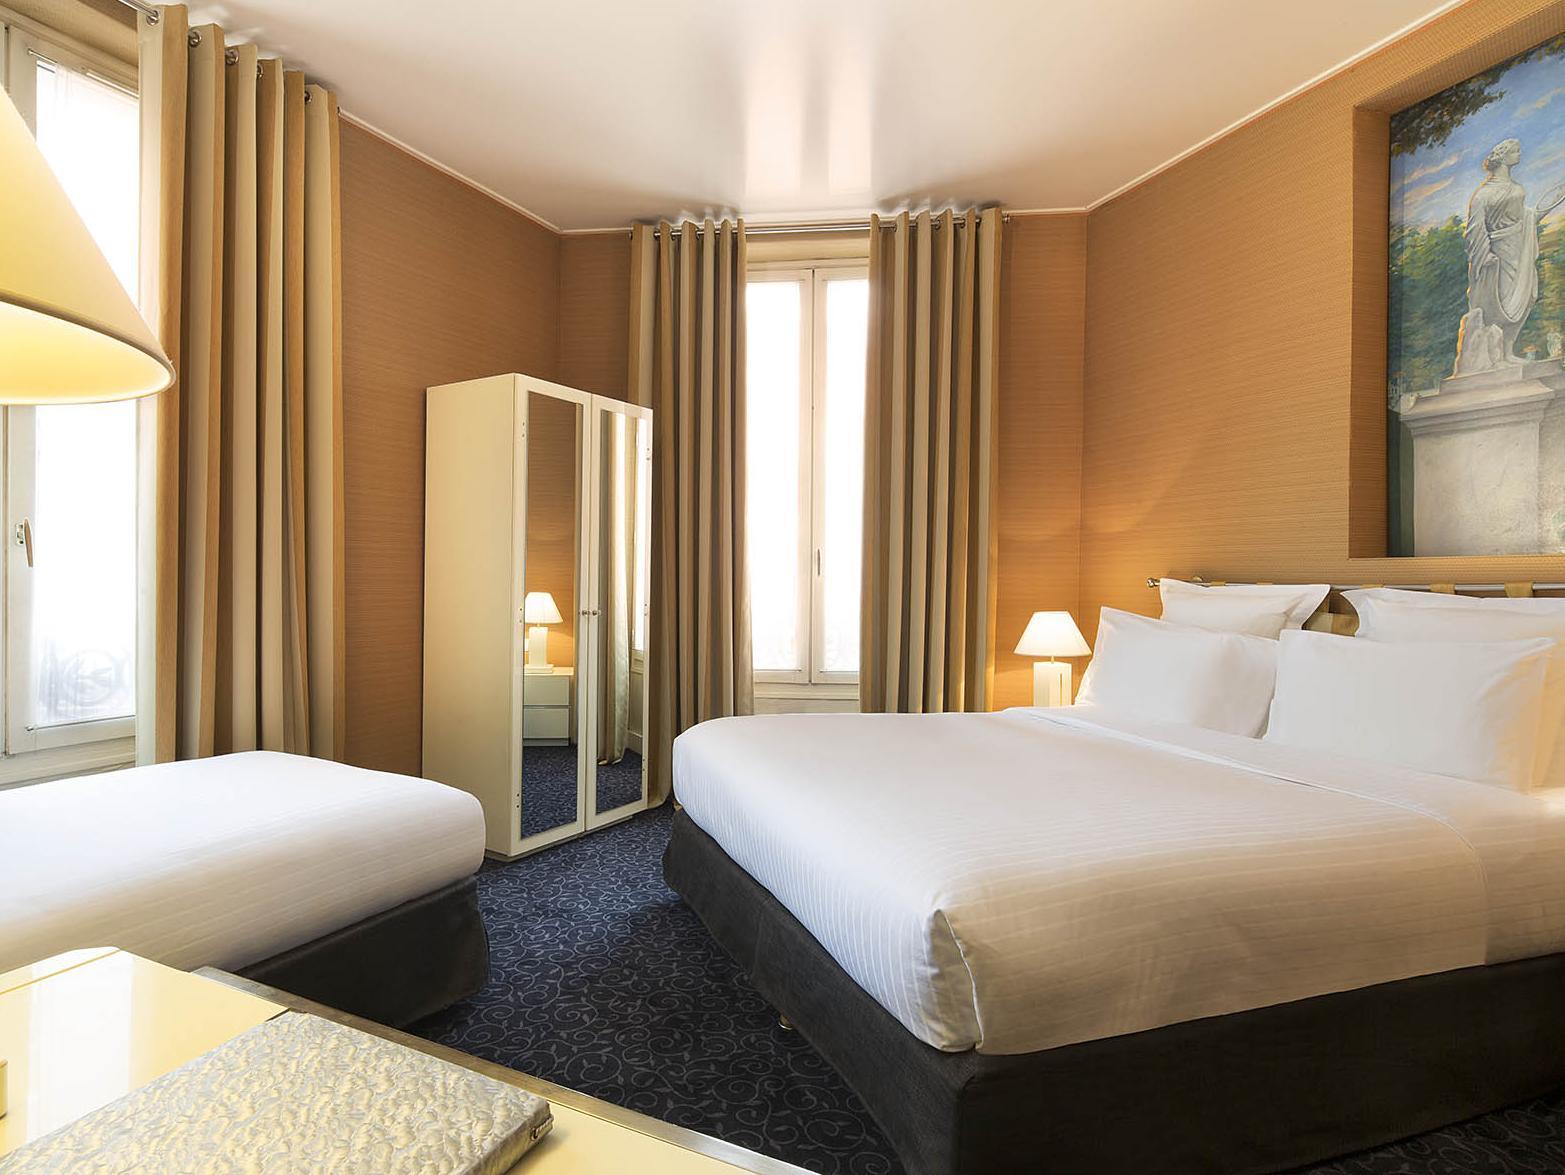 Hotel Elysa Luxembourg - Hotell och Boende i Frankrike i Europa